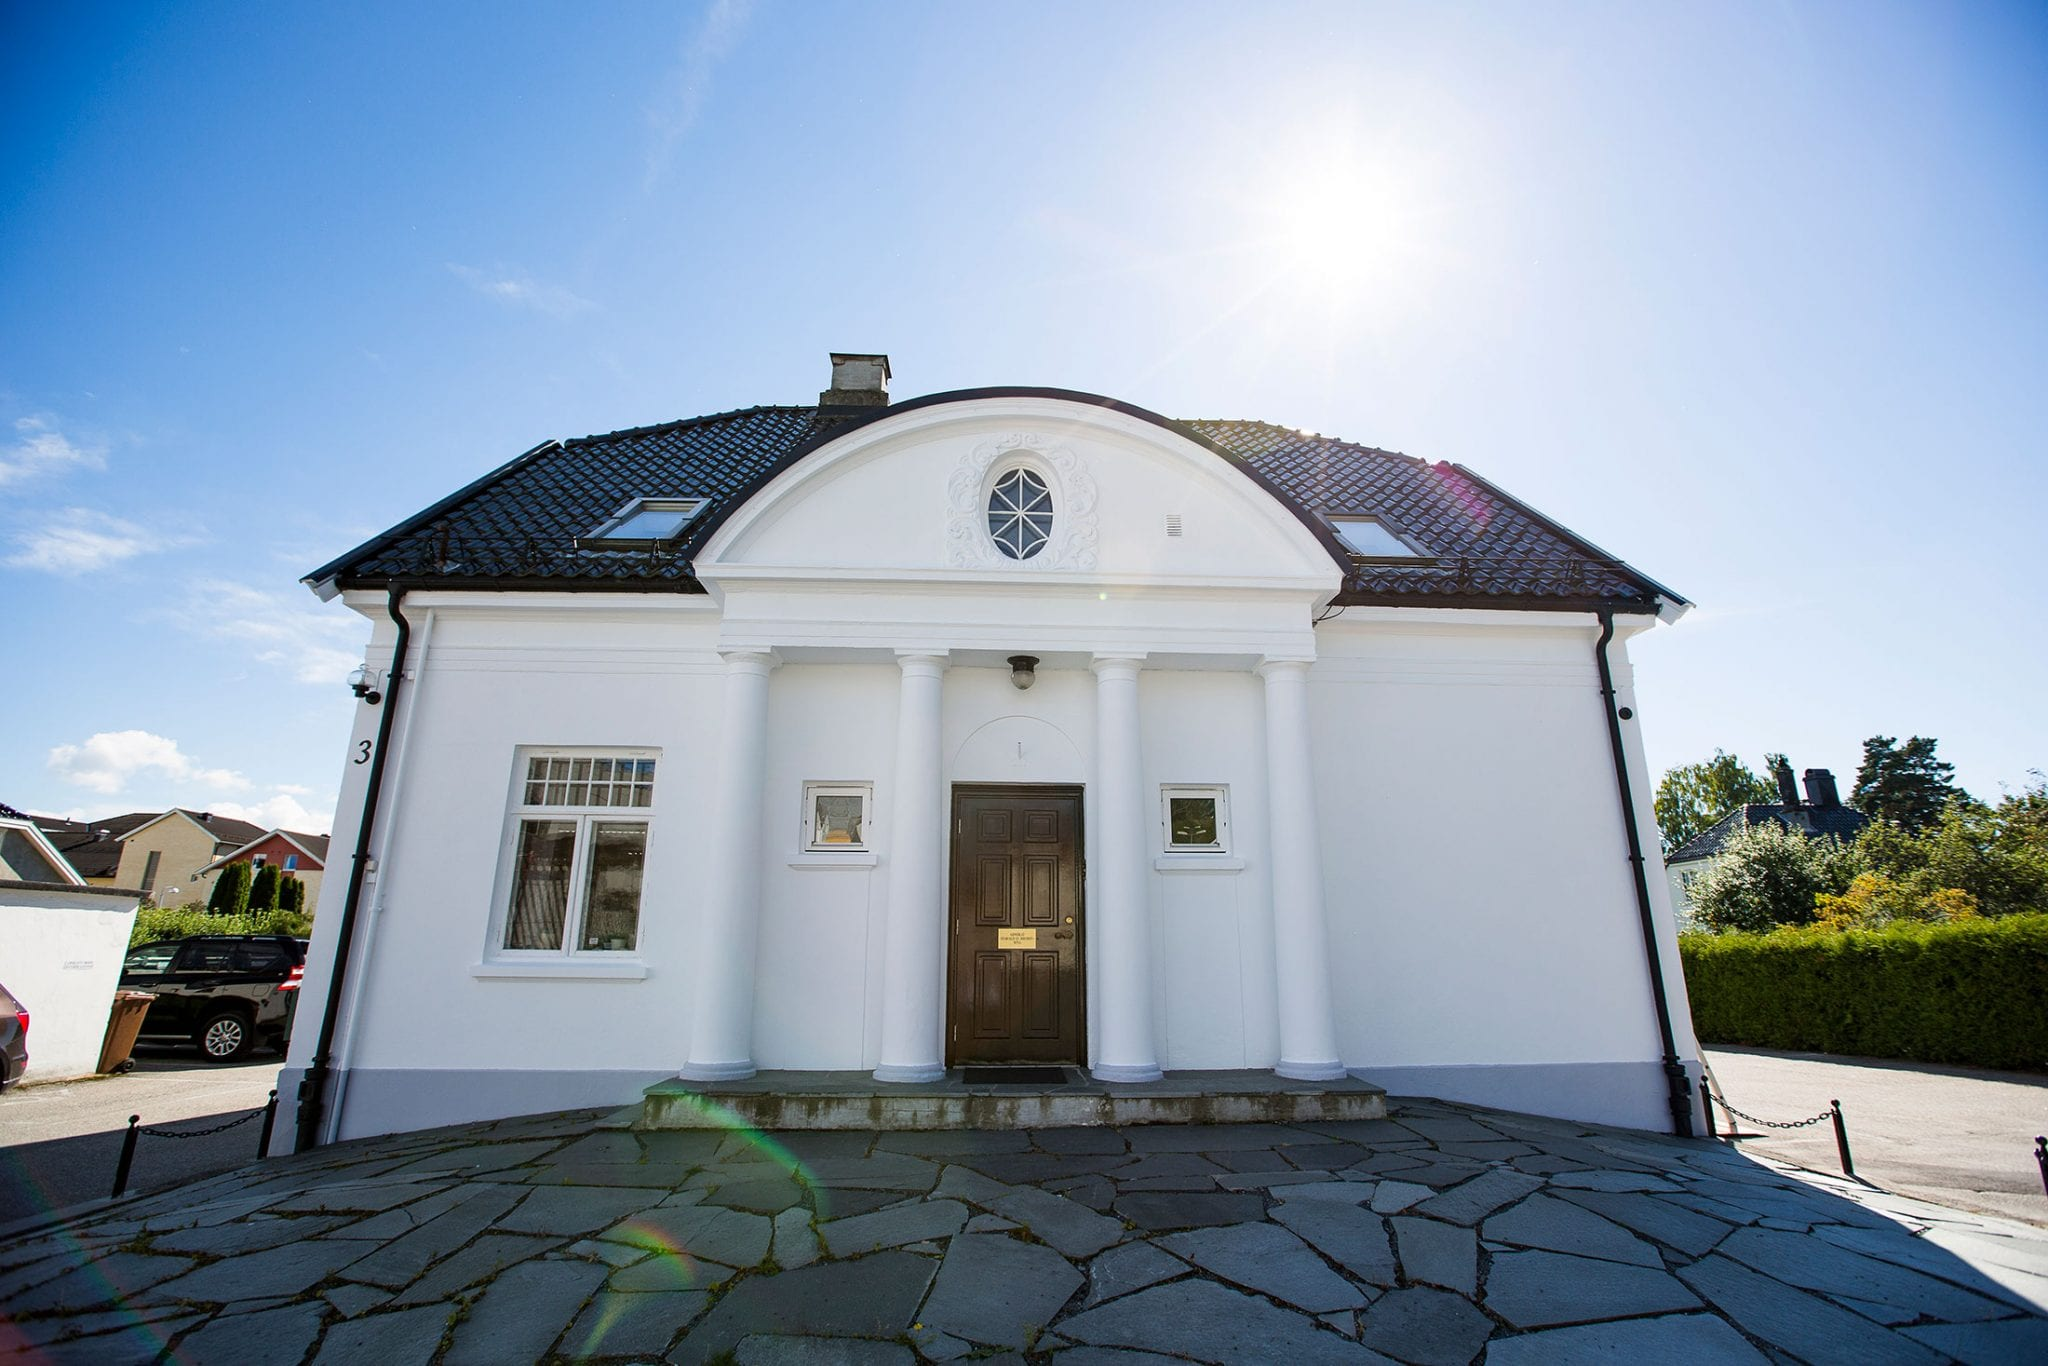 Brørby Eiendomsmegling - Hønefoss